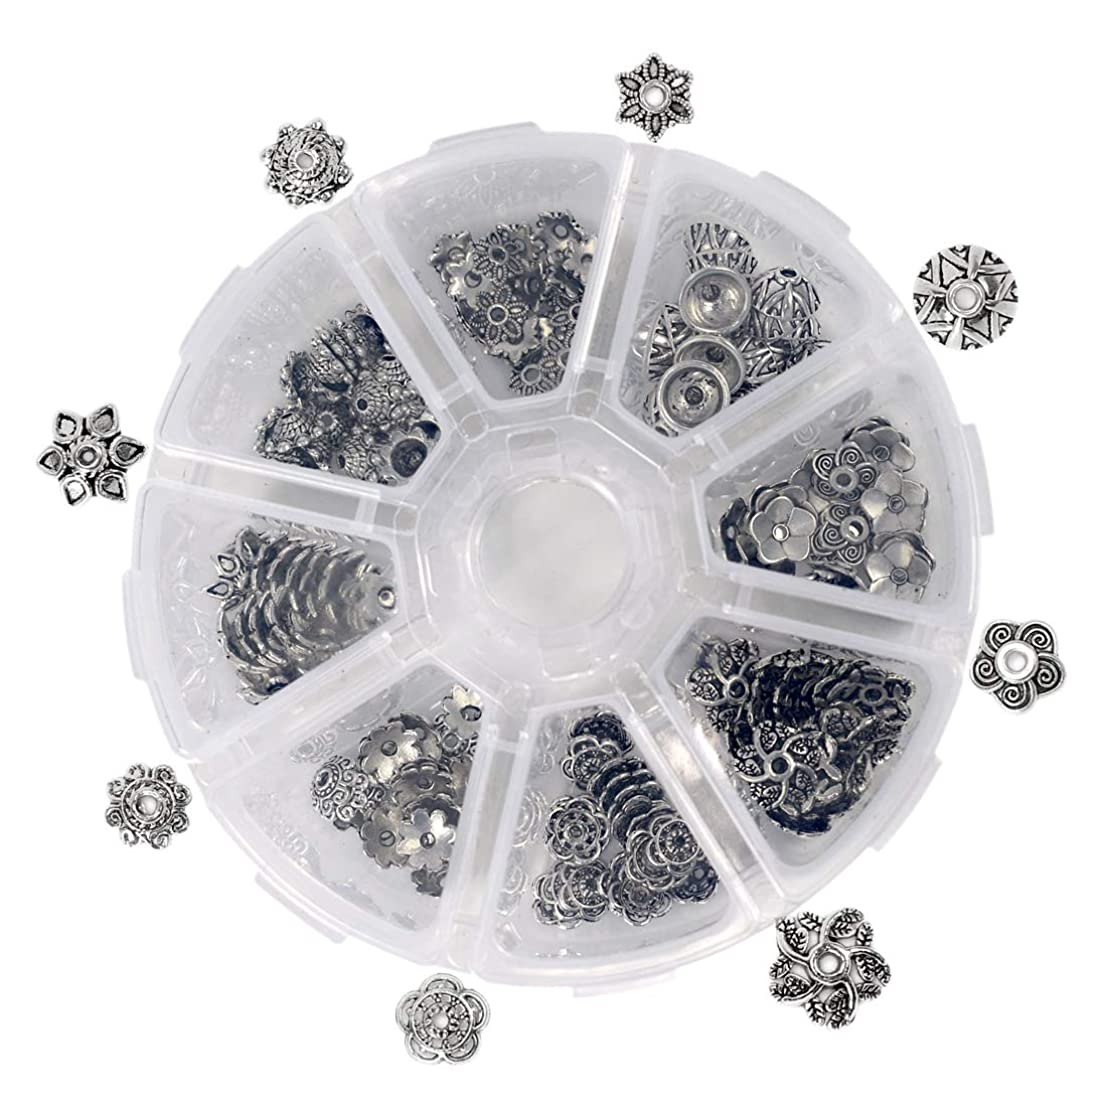 ZIIYAN 160 Pcs Antique Tibetan Silver Alloy Flower Petal Bead Caps Spacers Jewelry Making End Caps, 8-Style, 20 Pcs per Style